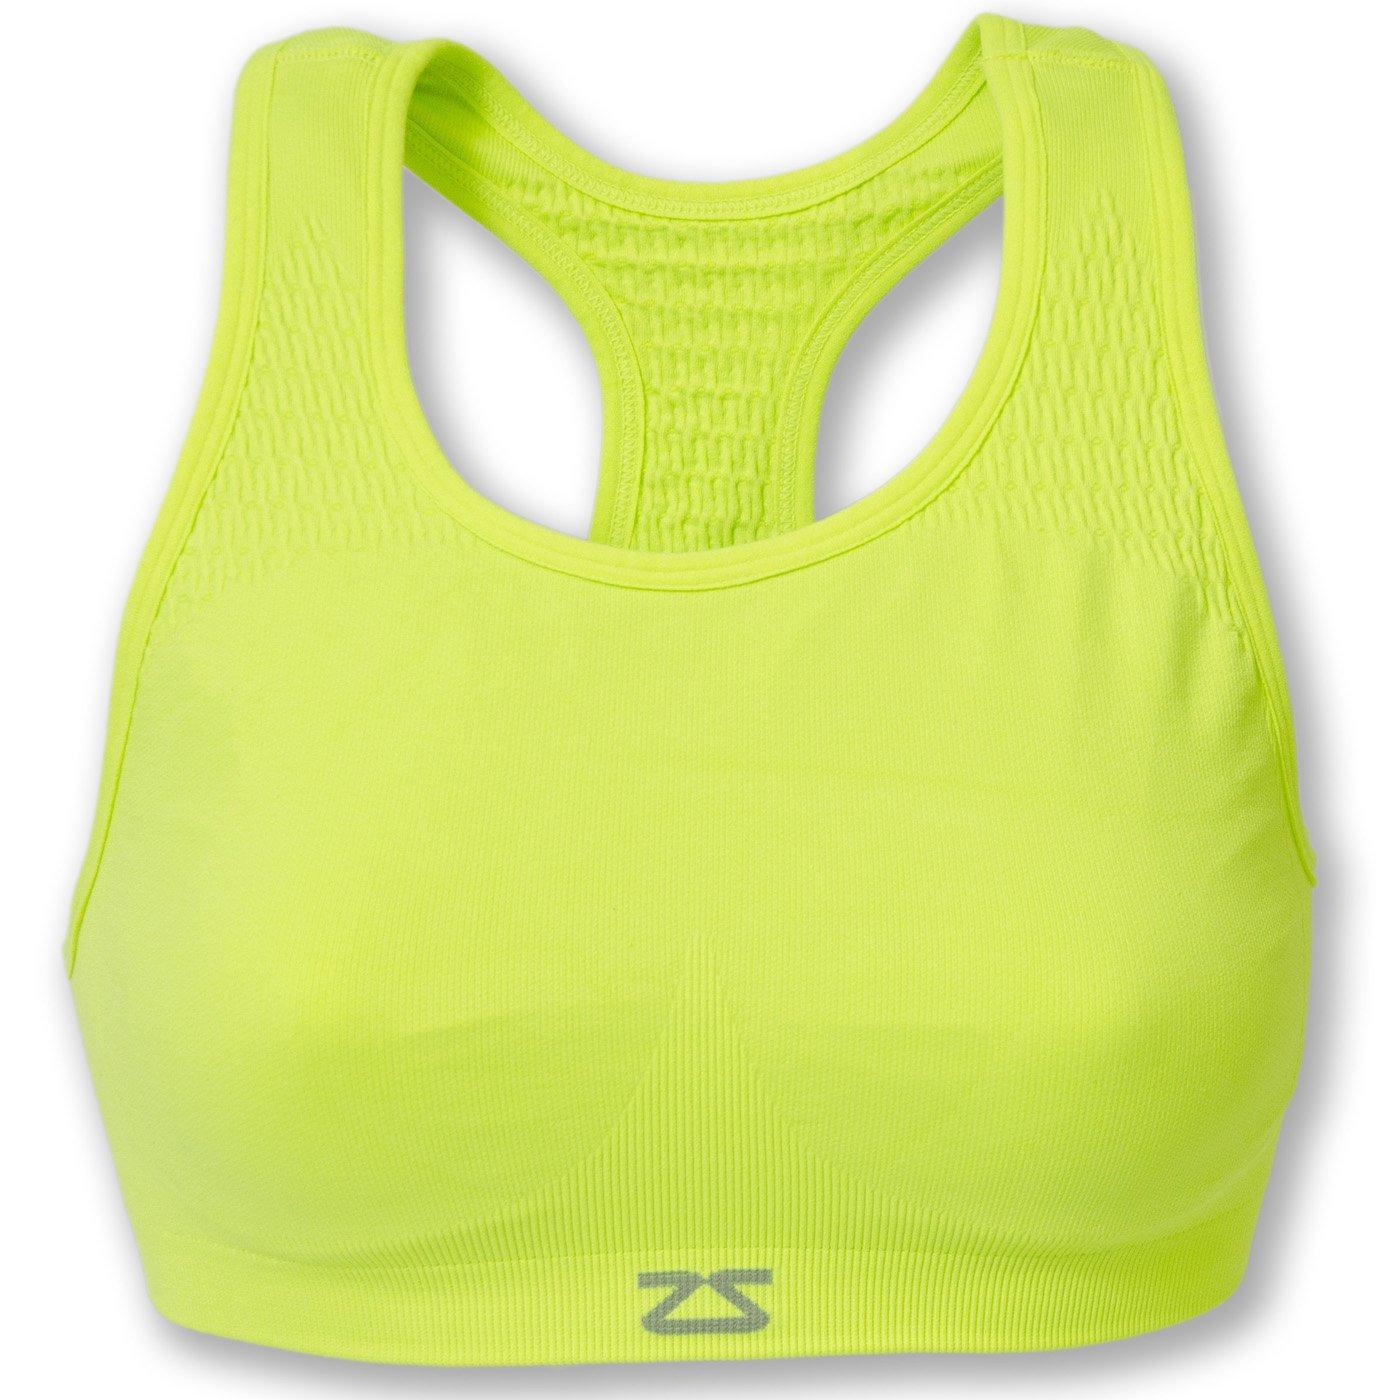 6fd360490b Amazon.com  Zensah Seamless Sports Bra - Best Sports Bra Running  Sports    Outdoors